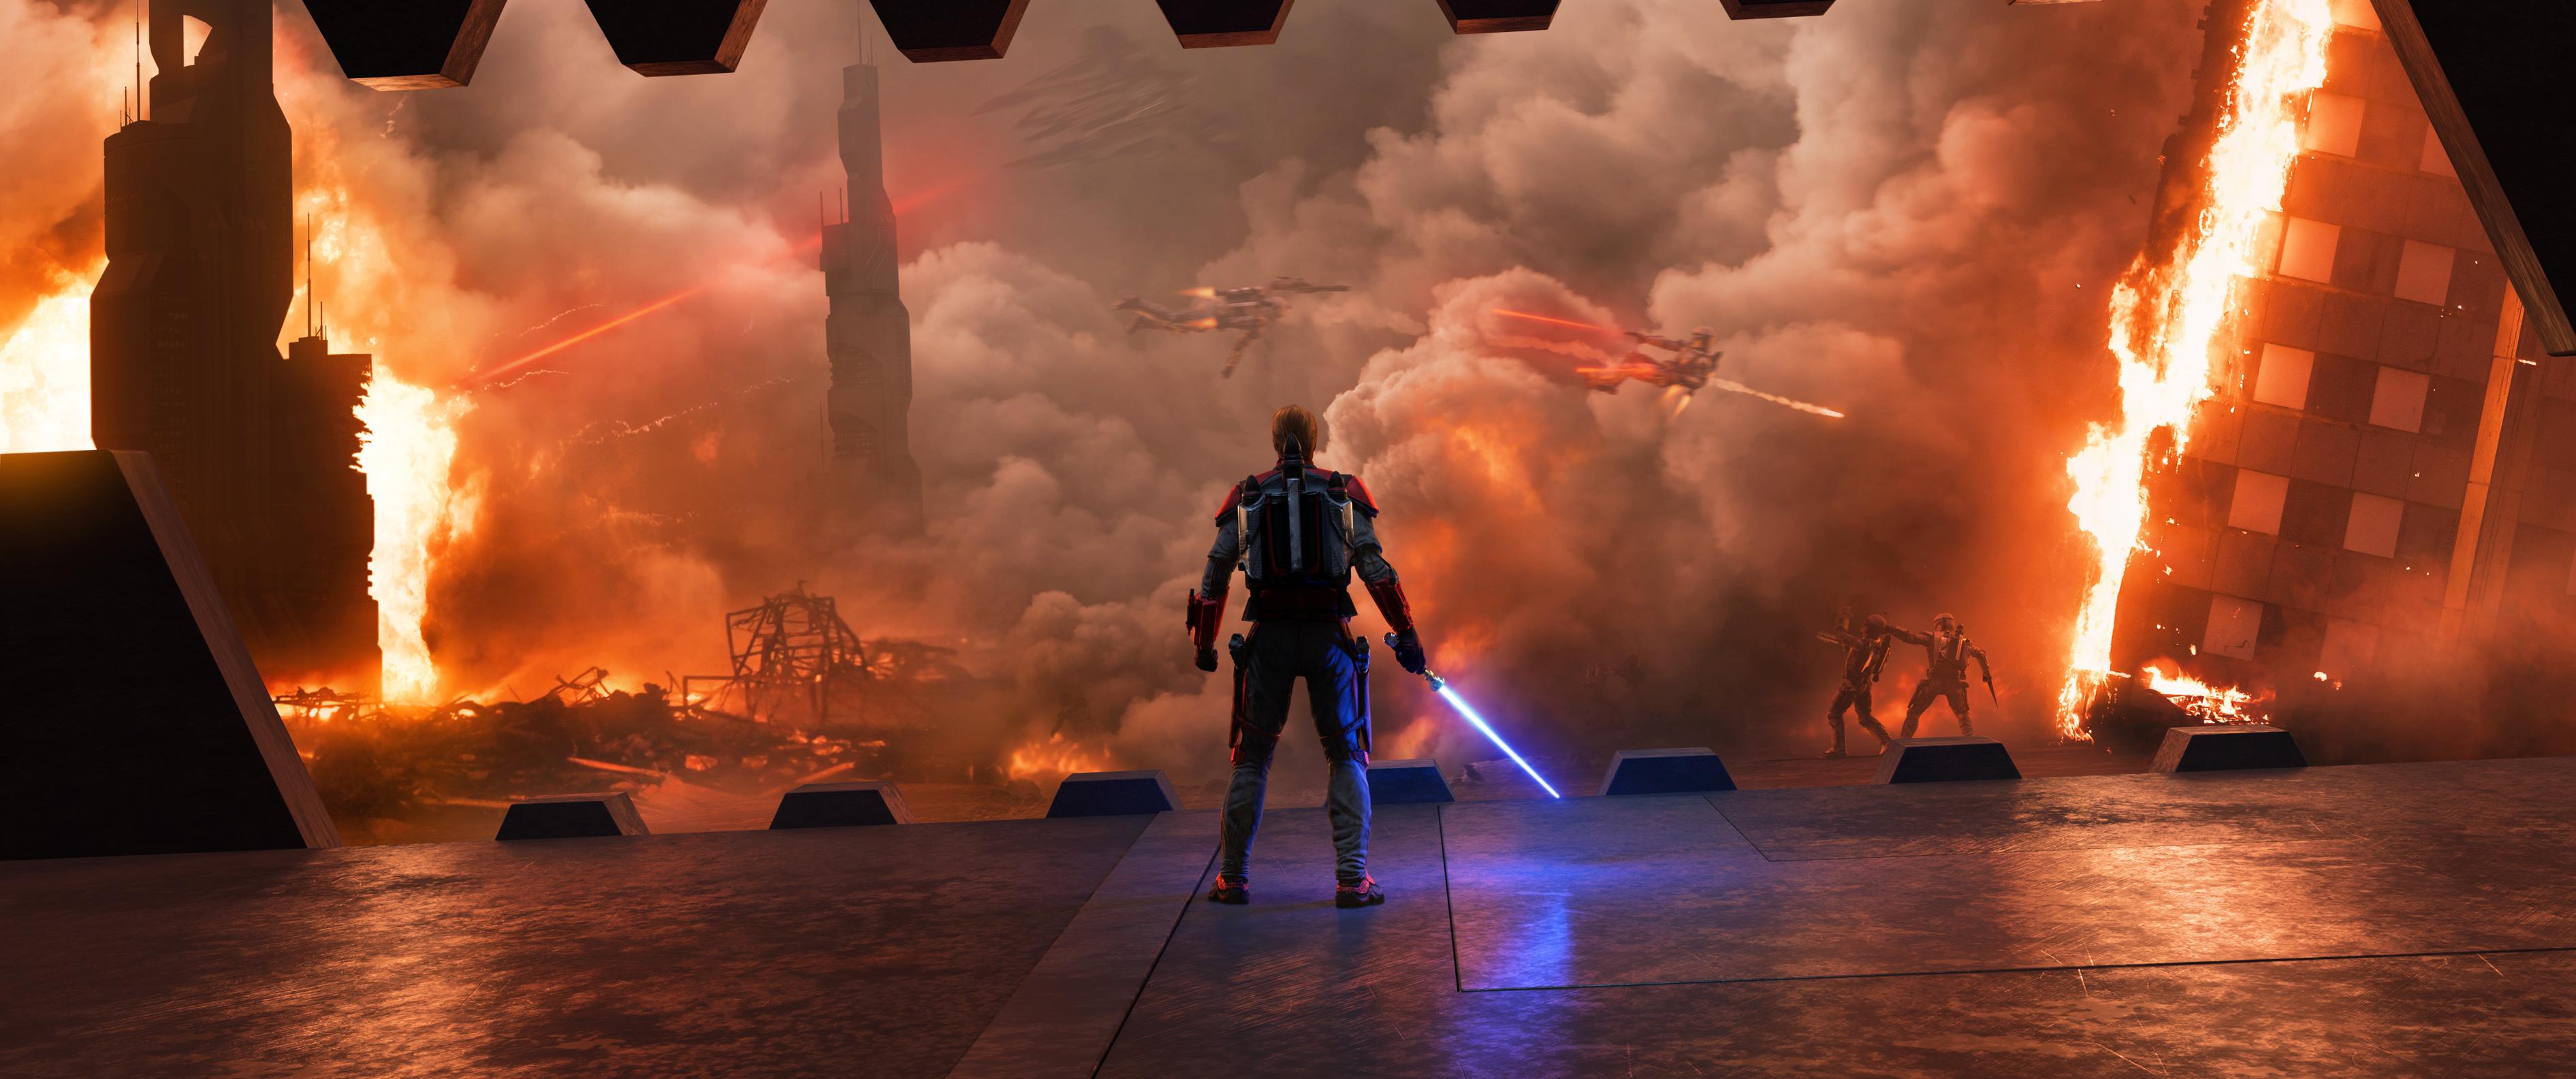 Star Wars - Siege of Mandalore by thetechromancer